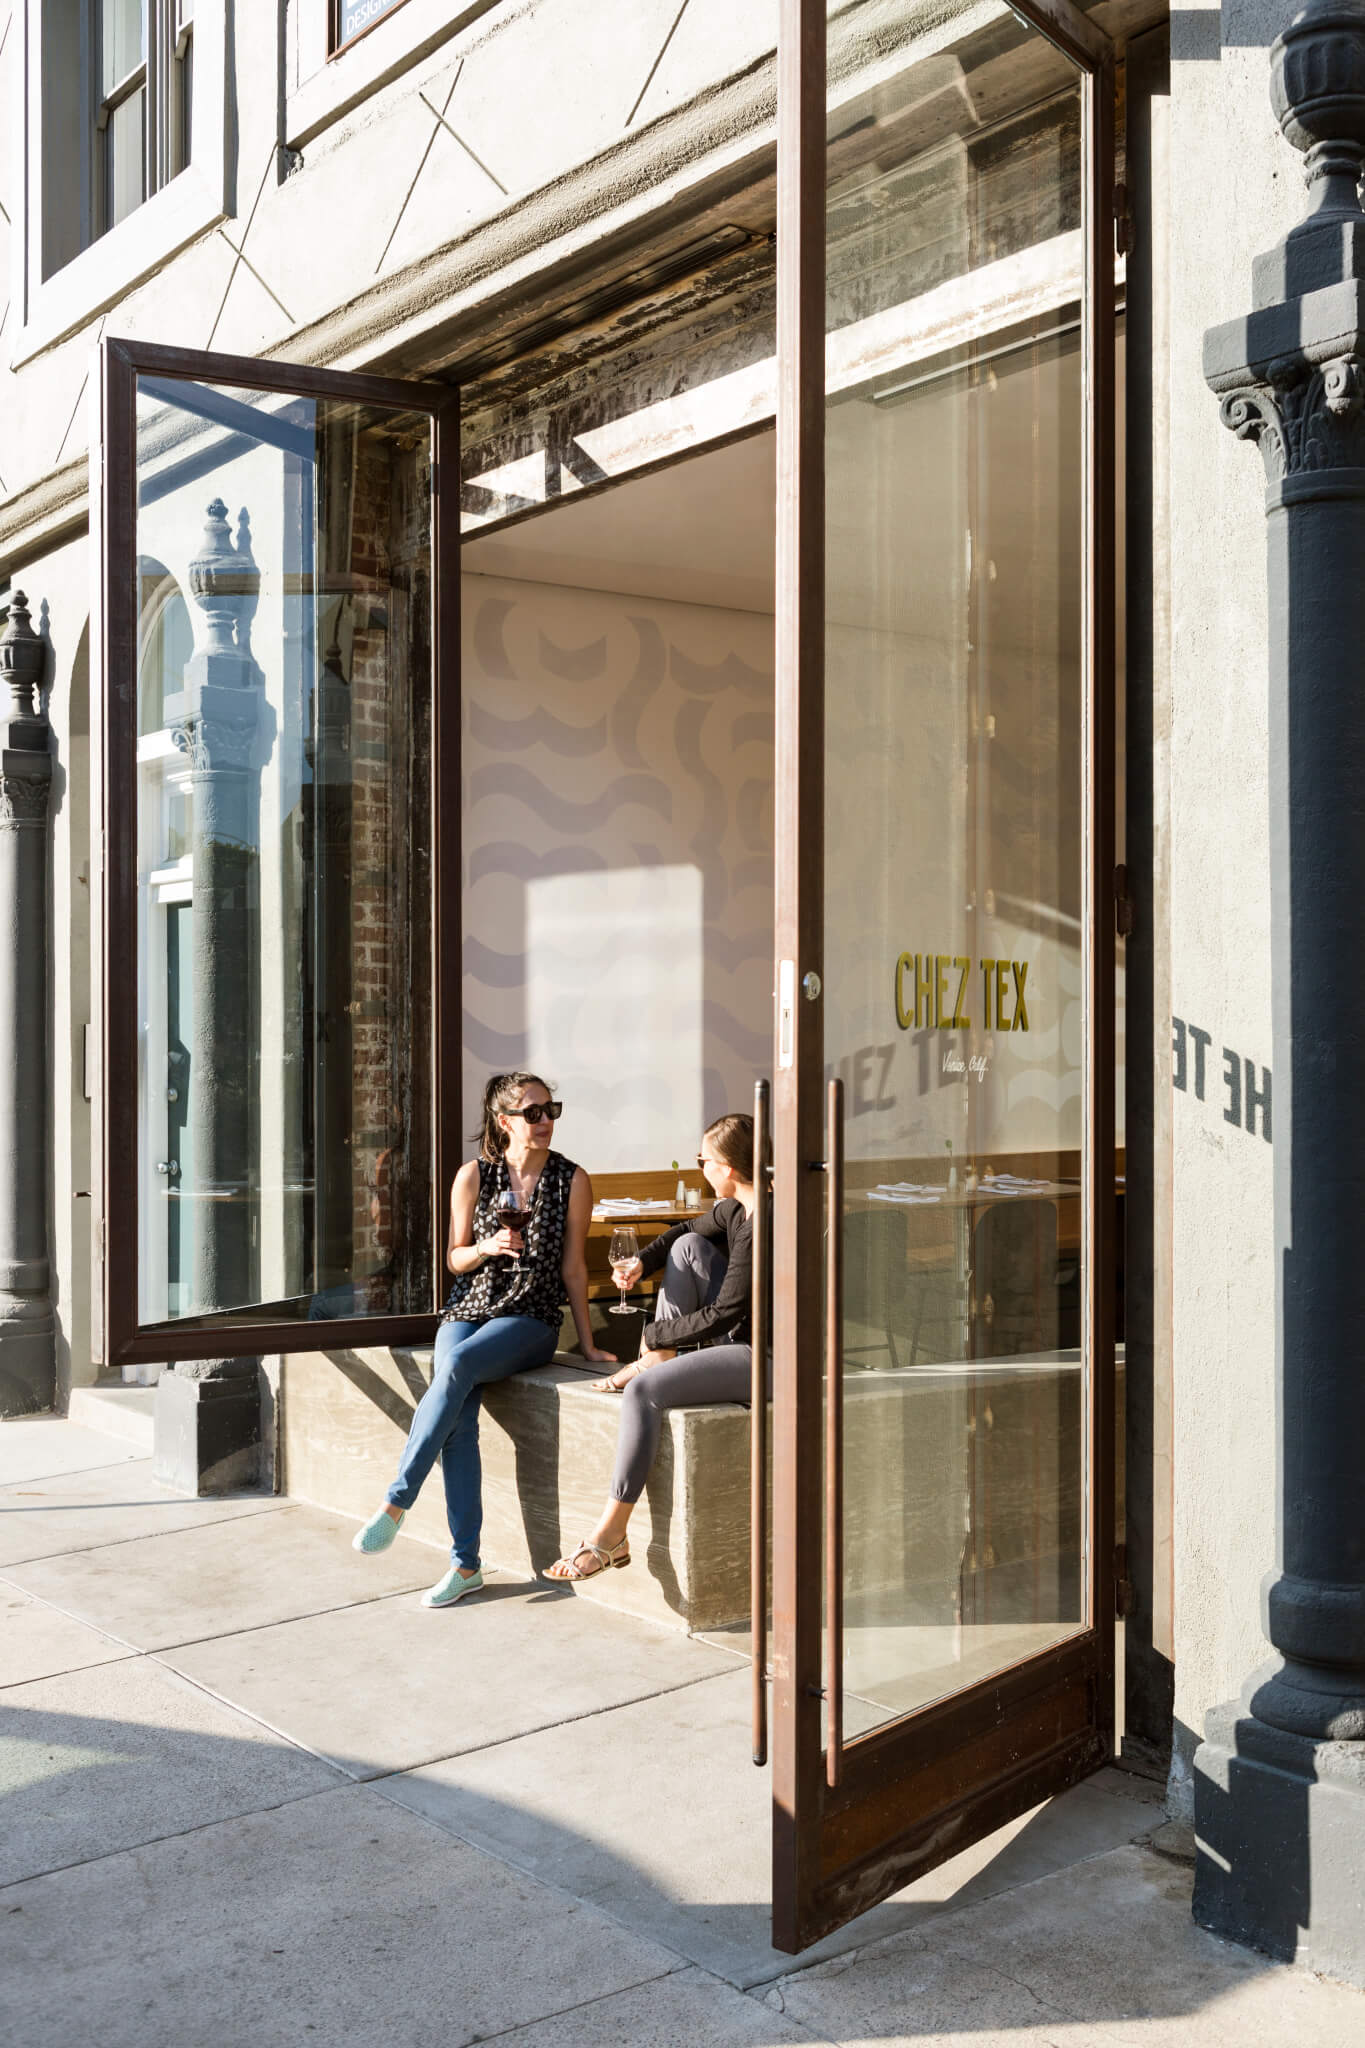 Chez Tex_Storefront Open